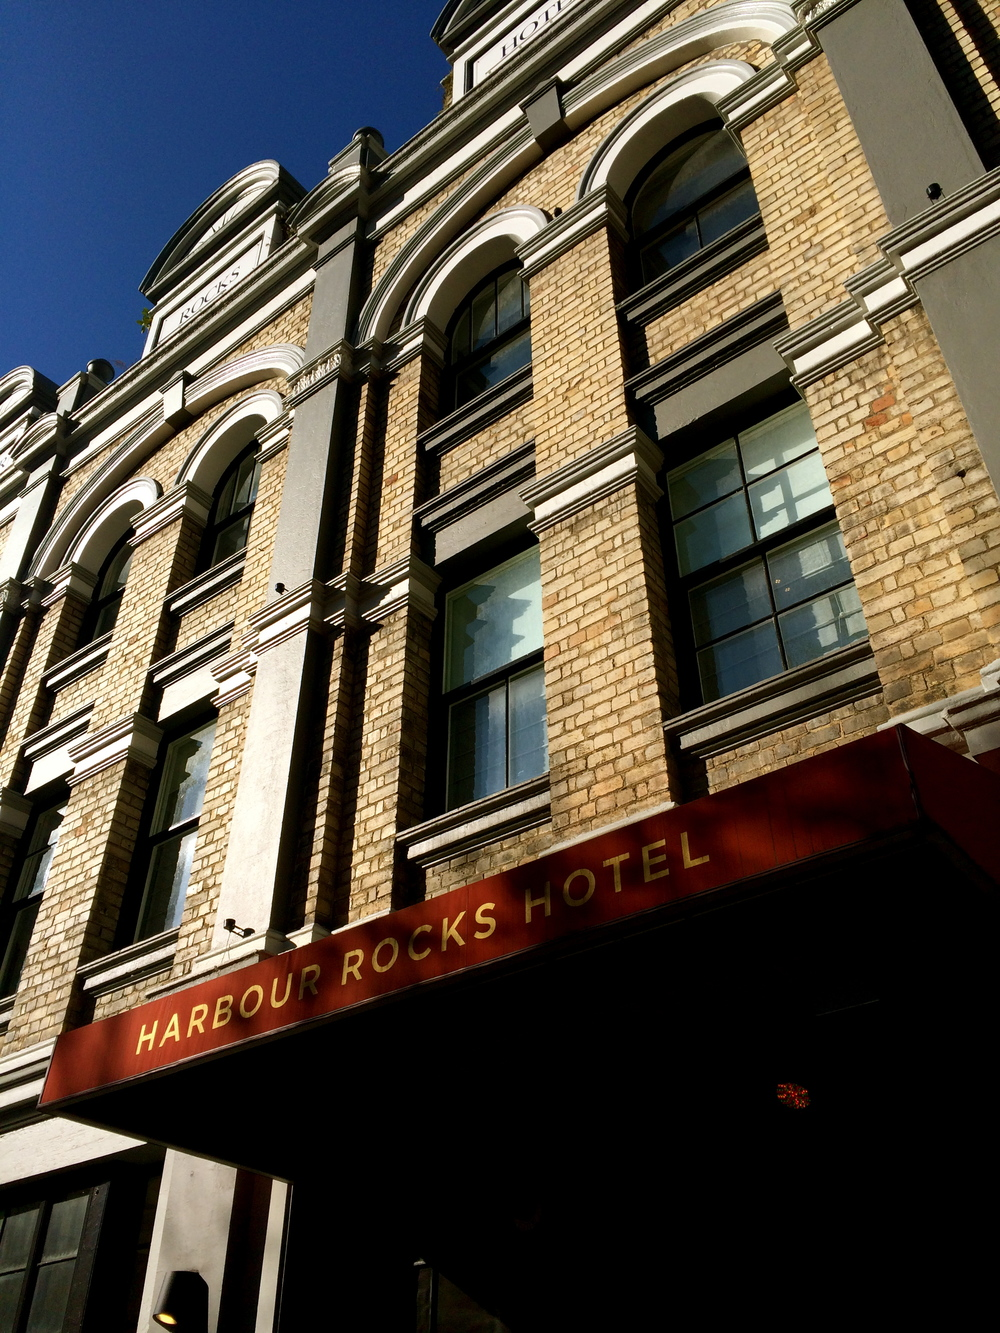 ◆ Harbour Rocks Hotel